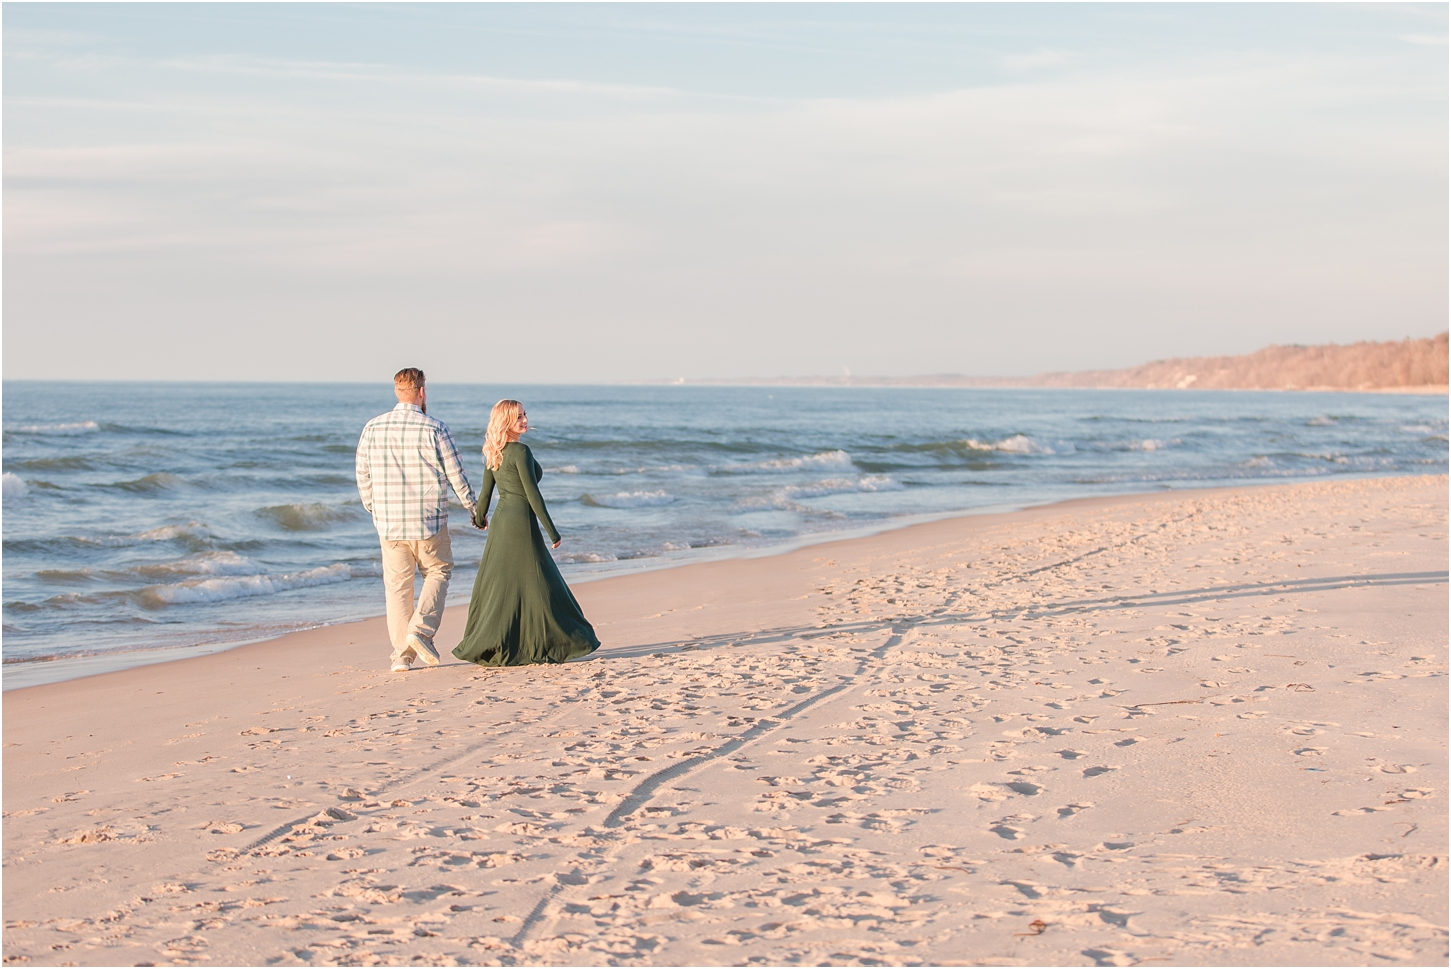 romantic-sunset-beach-engagement-photos-at-silver-beach-in-saint-joseph-mi-by-courtney-carolyn-photography_0026.jpg